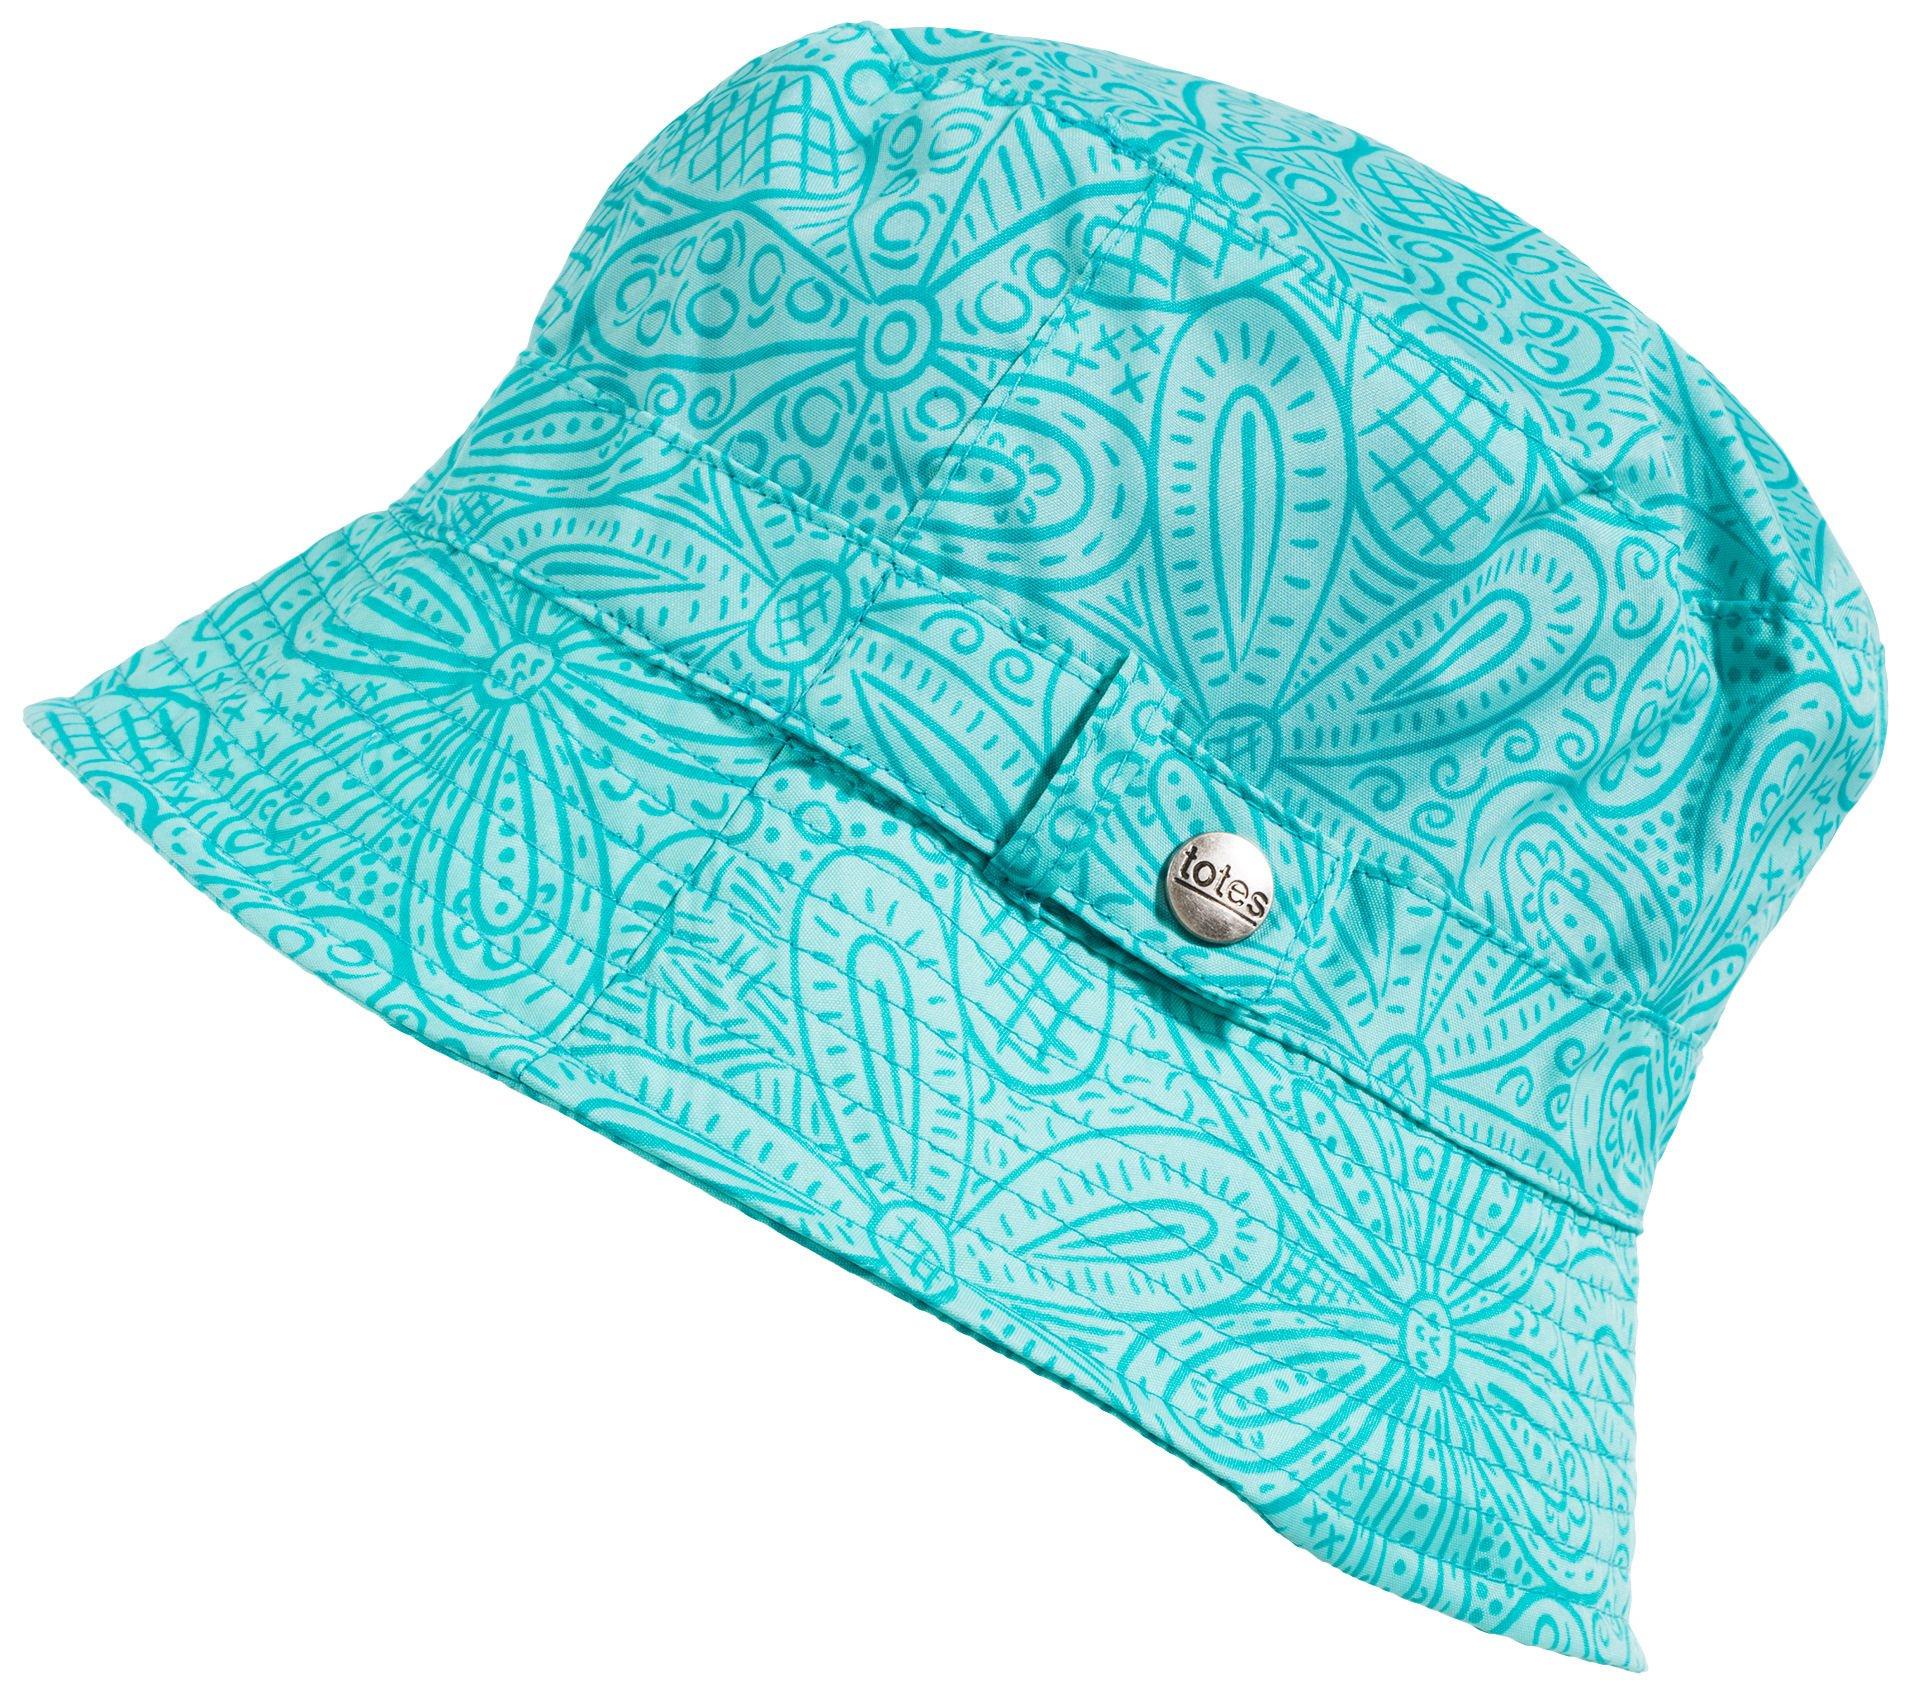 totes Women's Fashion Bucket Rain Hat, G Blue Floral Burst, One Size